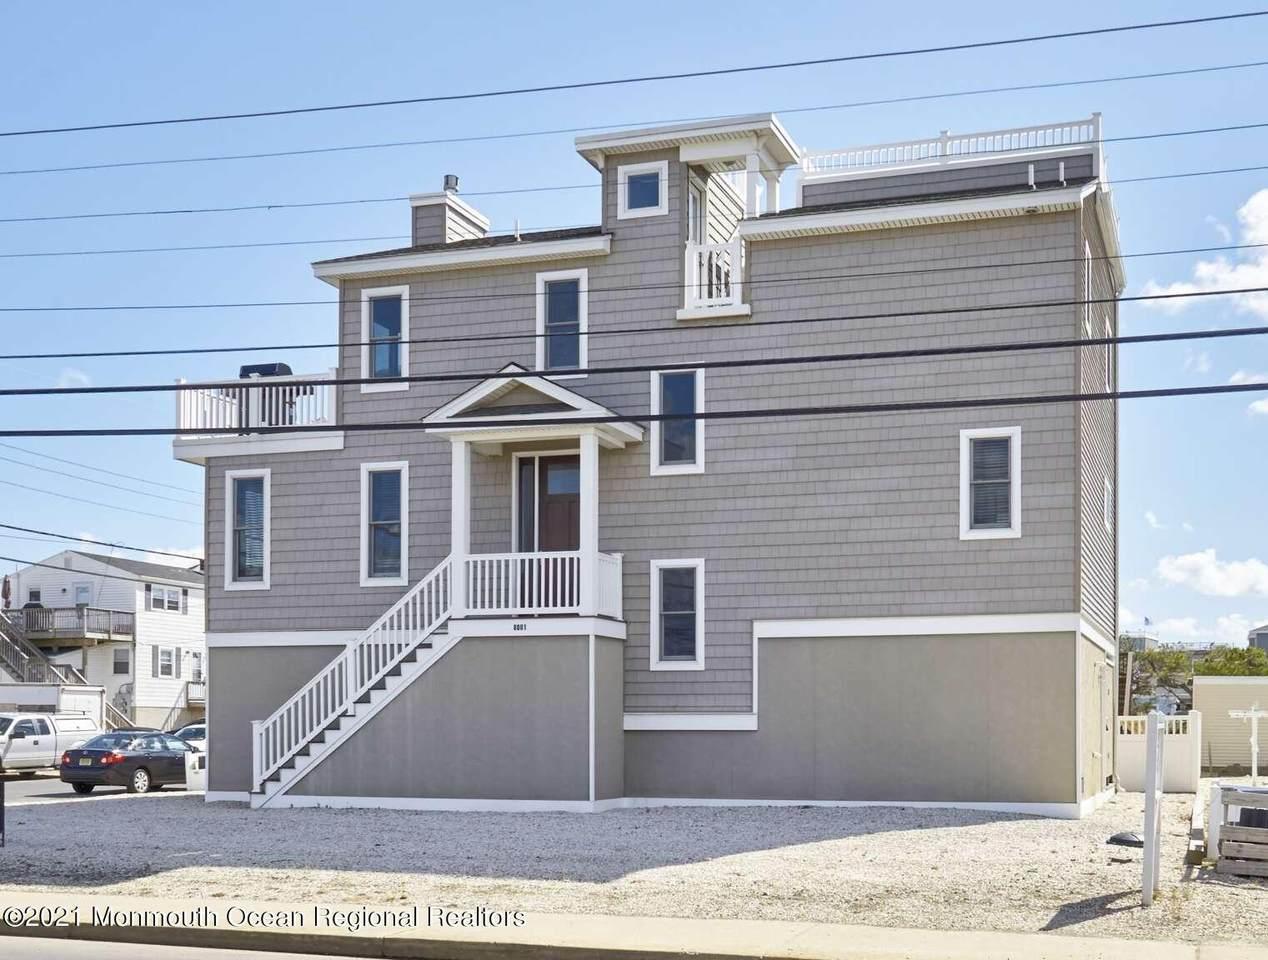 8001 Long Beach Boulevard - Photo 1